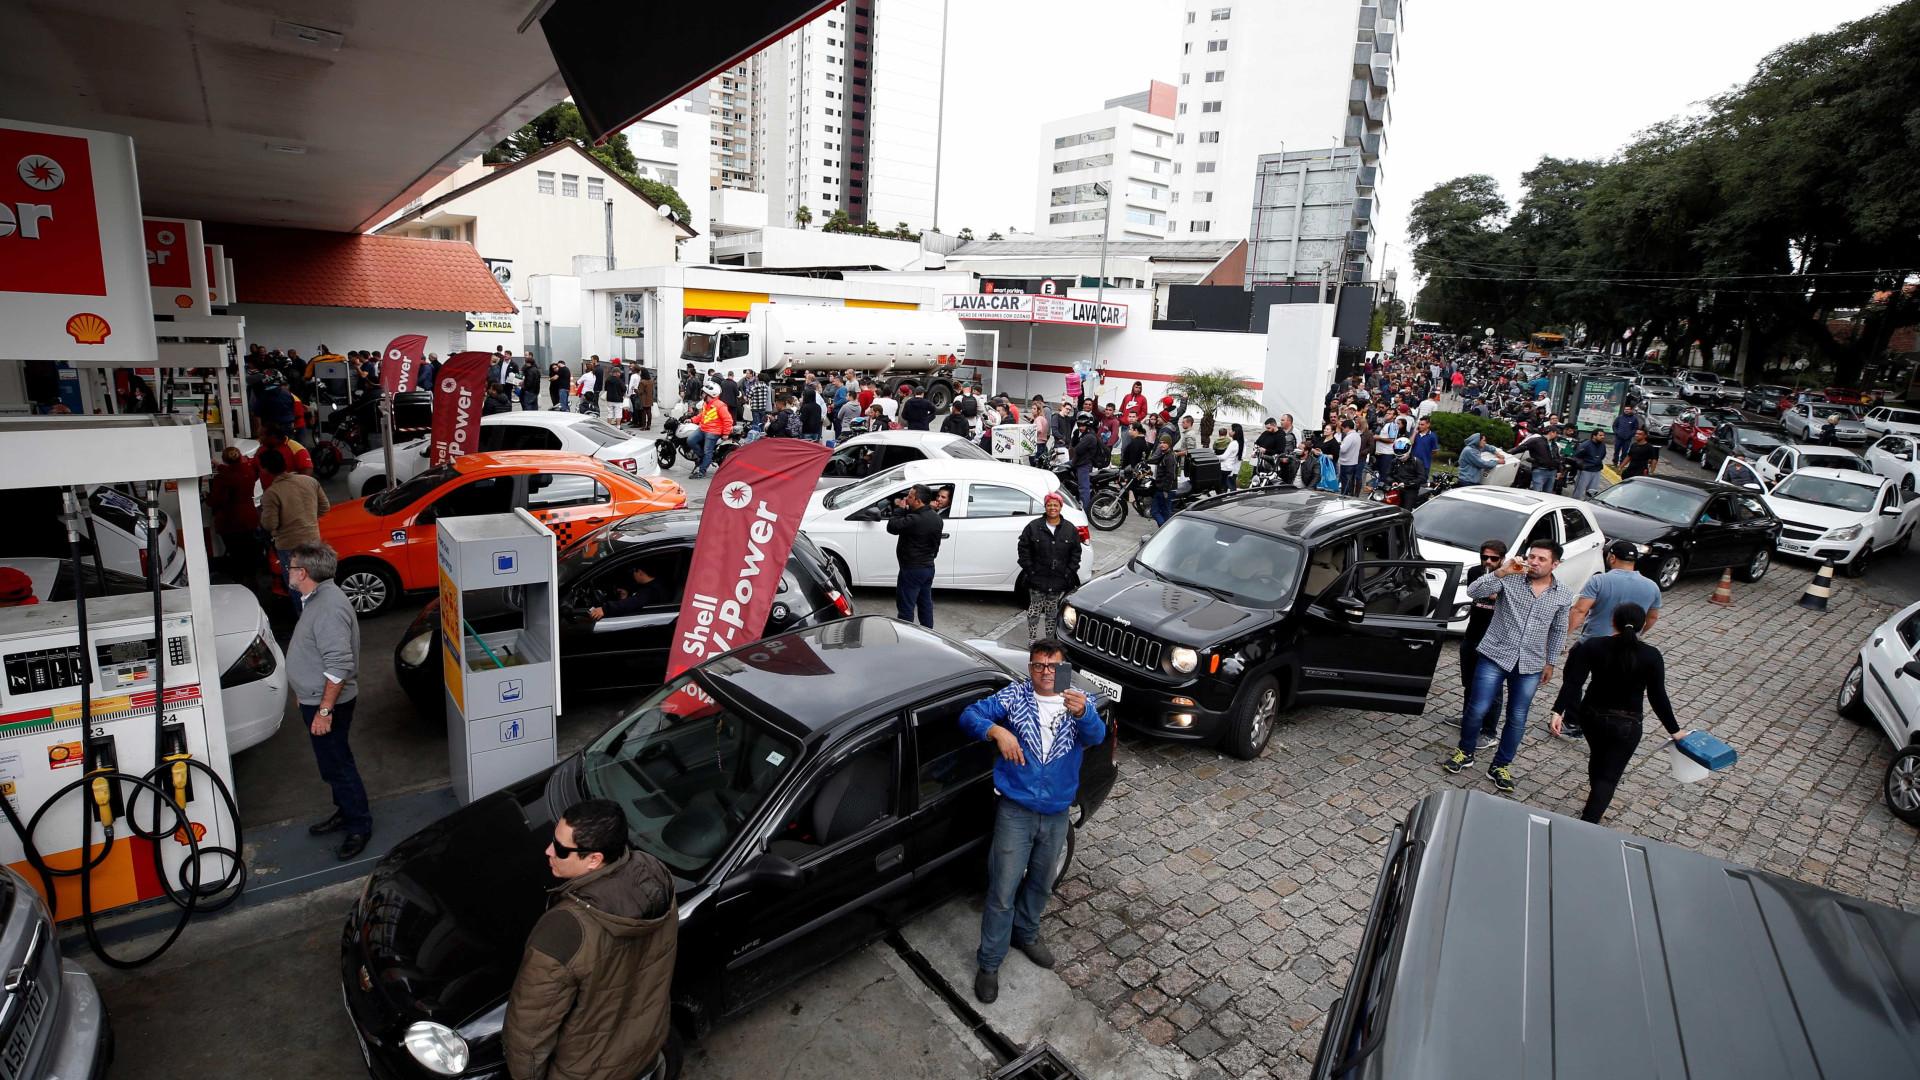 Greve dos caminhoneiros: Procon dá dicas aos consumidores